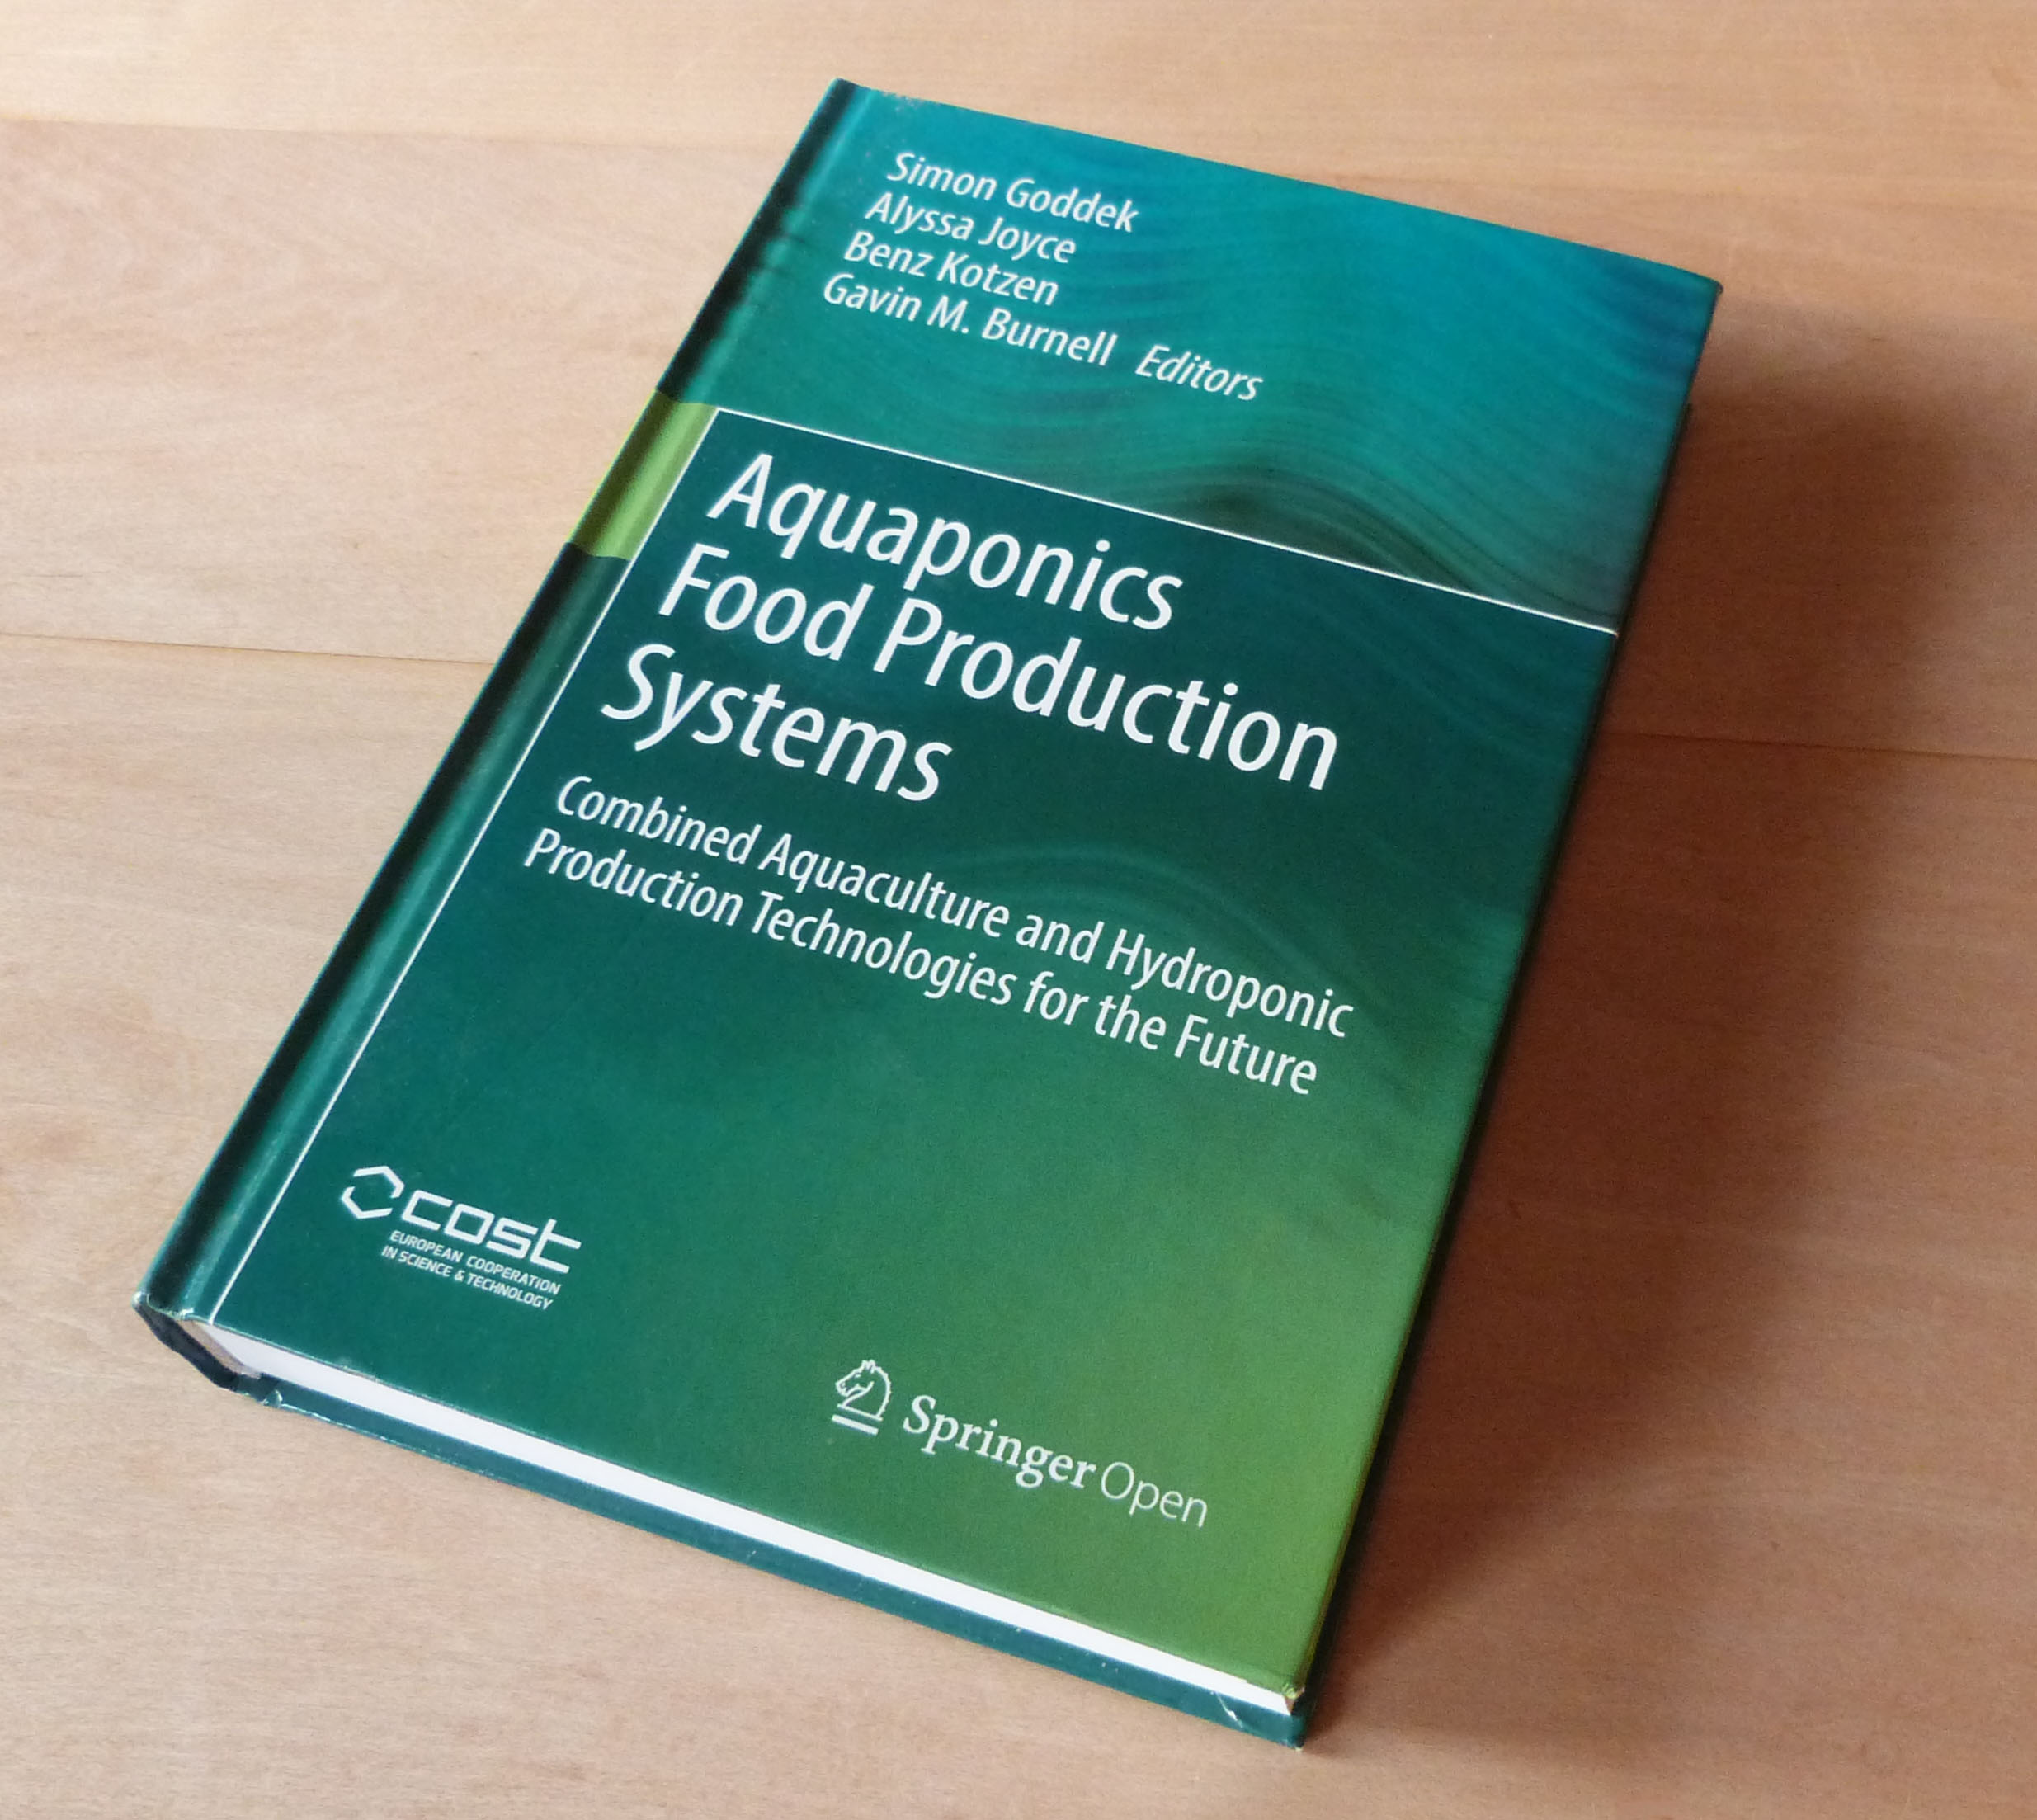 "Buch zur Aquaponik-Forschung ""Aquaponics Food Production Systems"""